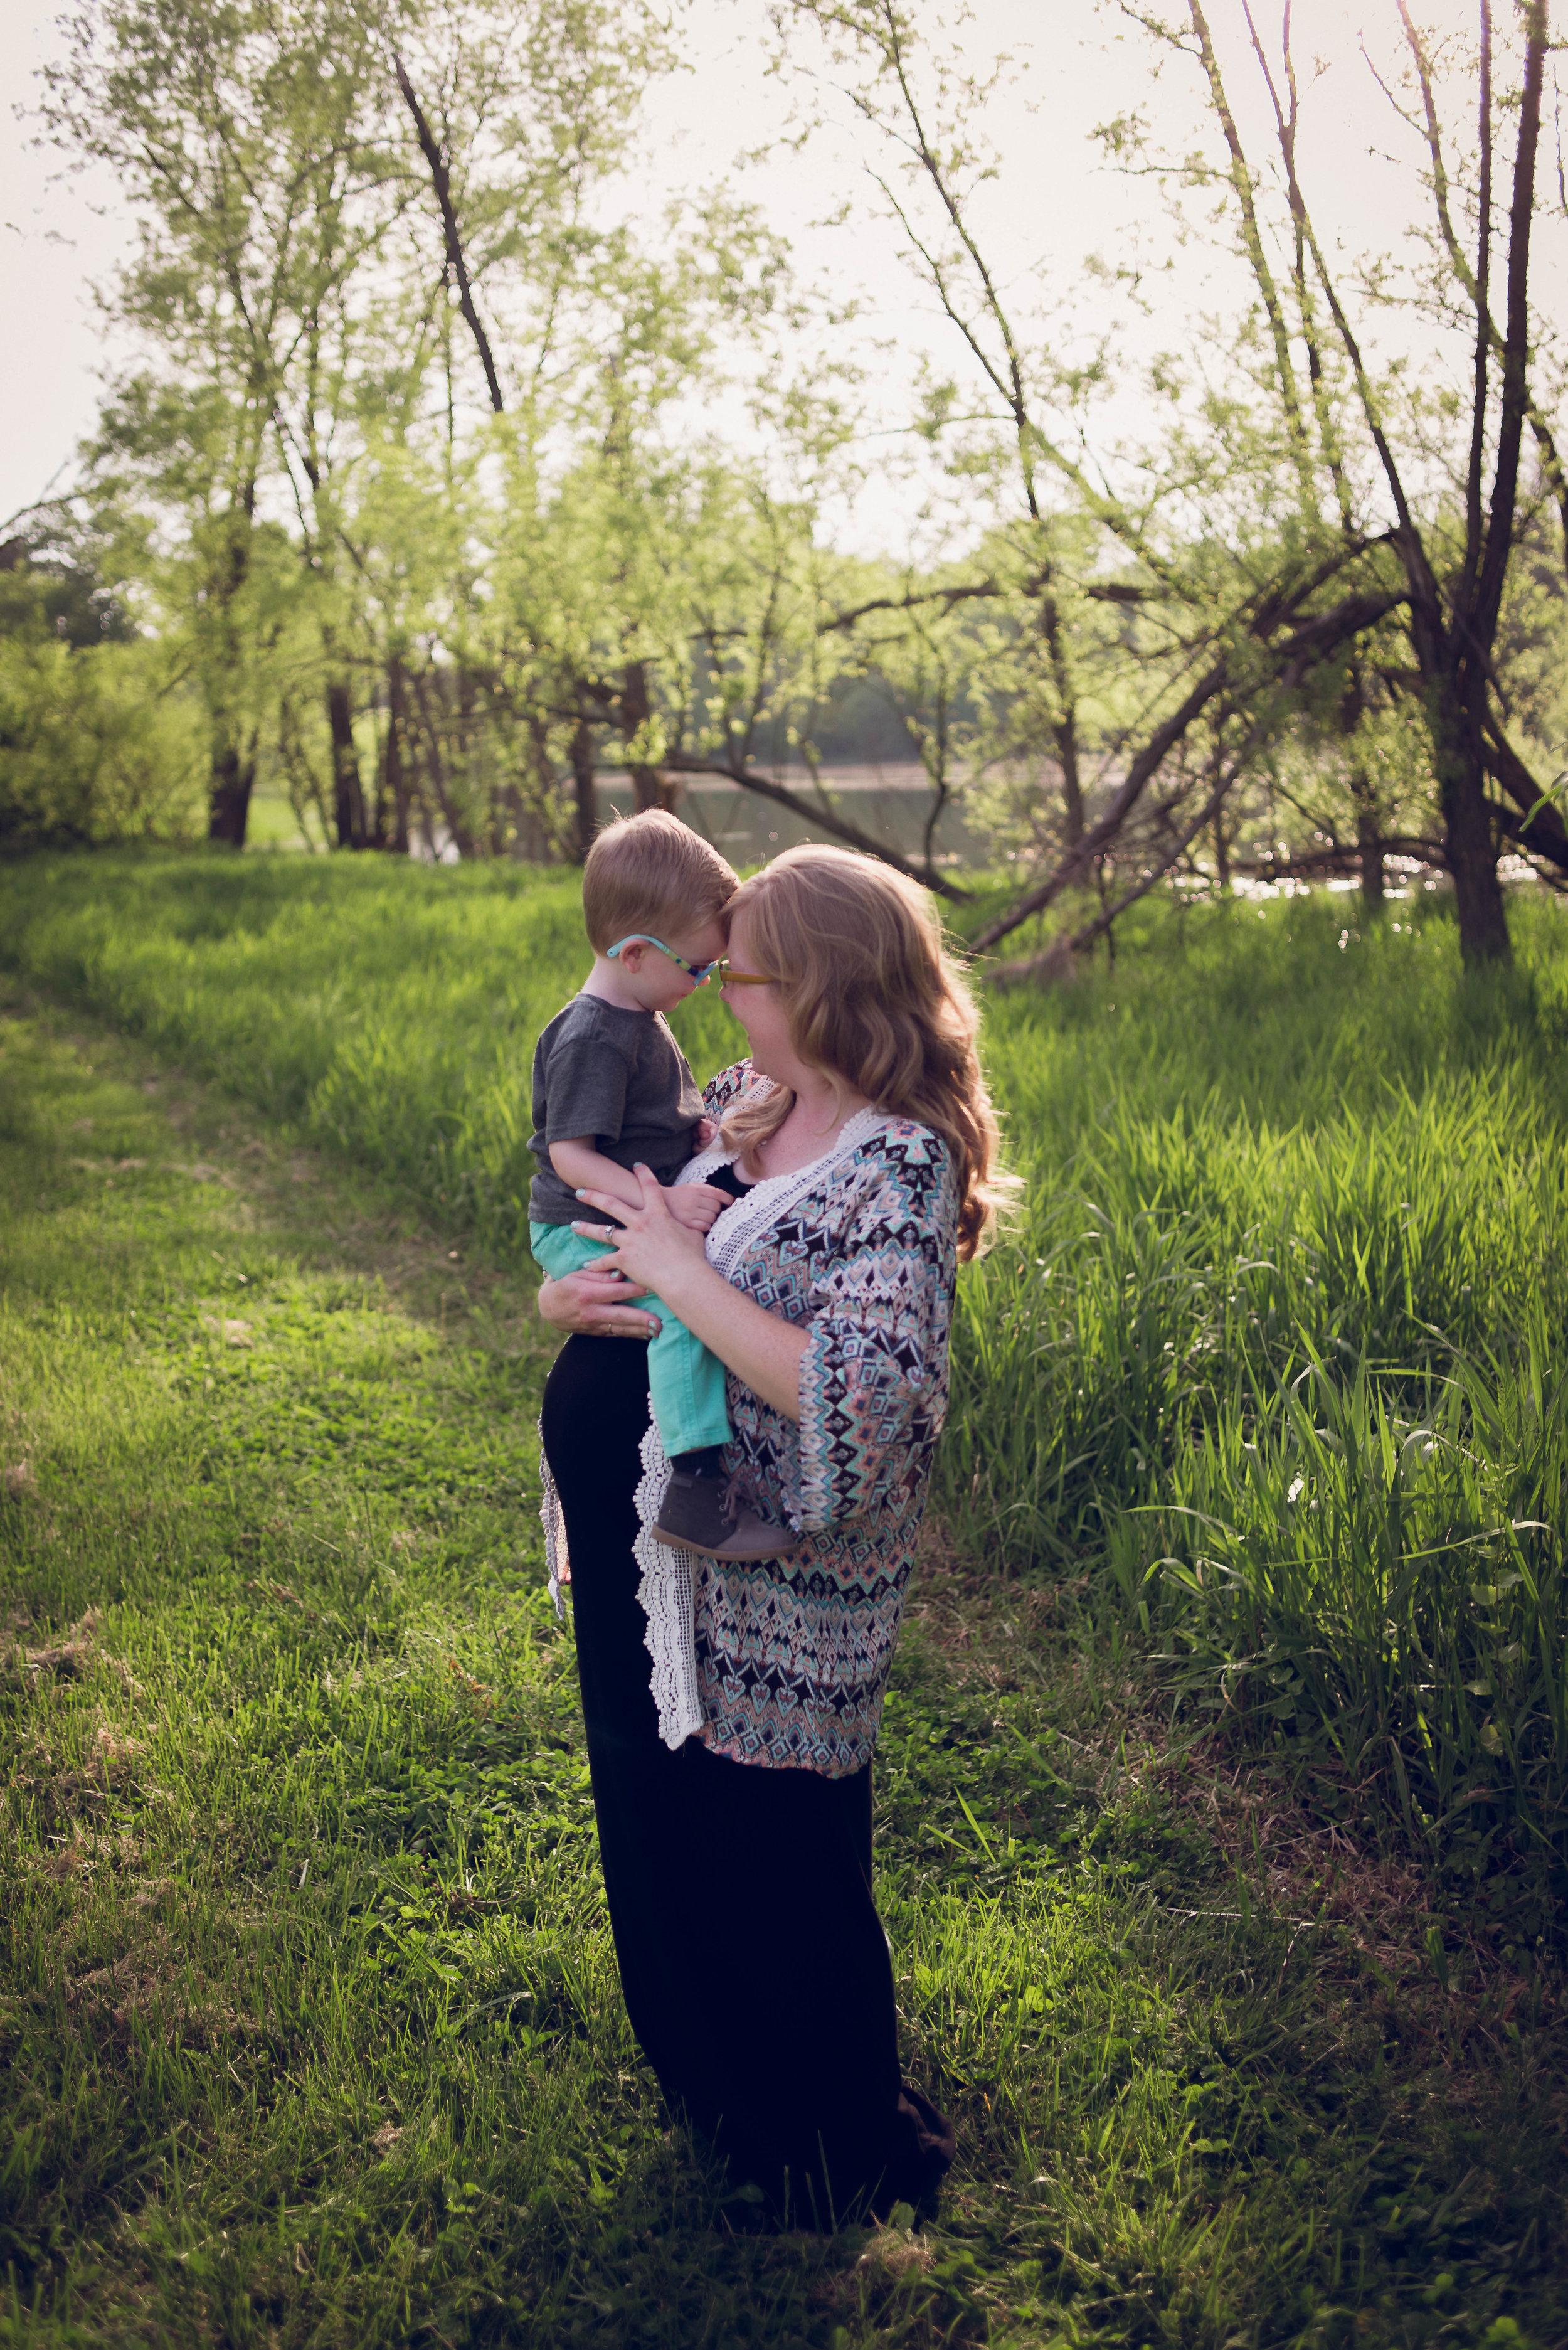 BrittneyHogue-MaternityPregnancyPhotographer-PeoriaIL-PekinIL-BloomingtonIL-5766.jpg